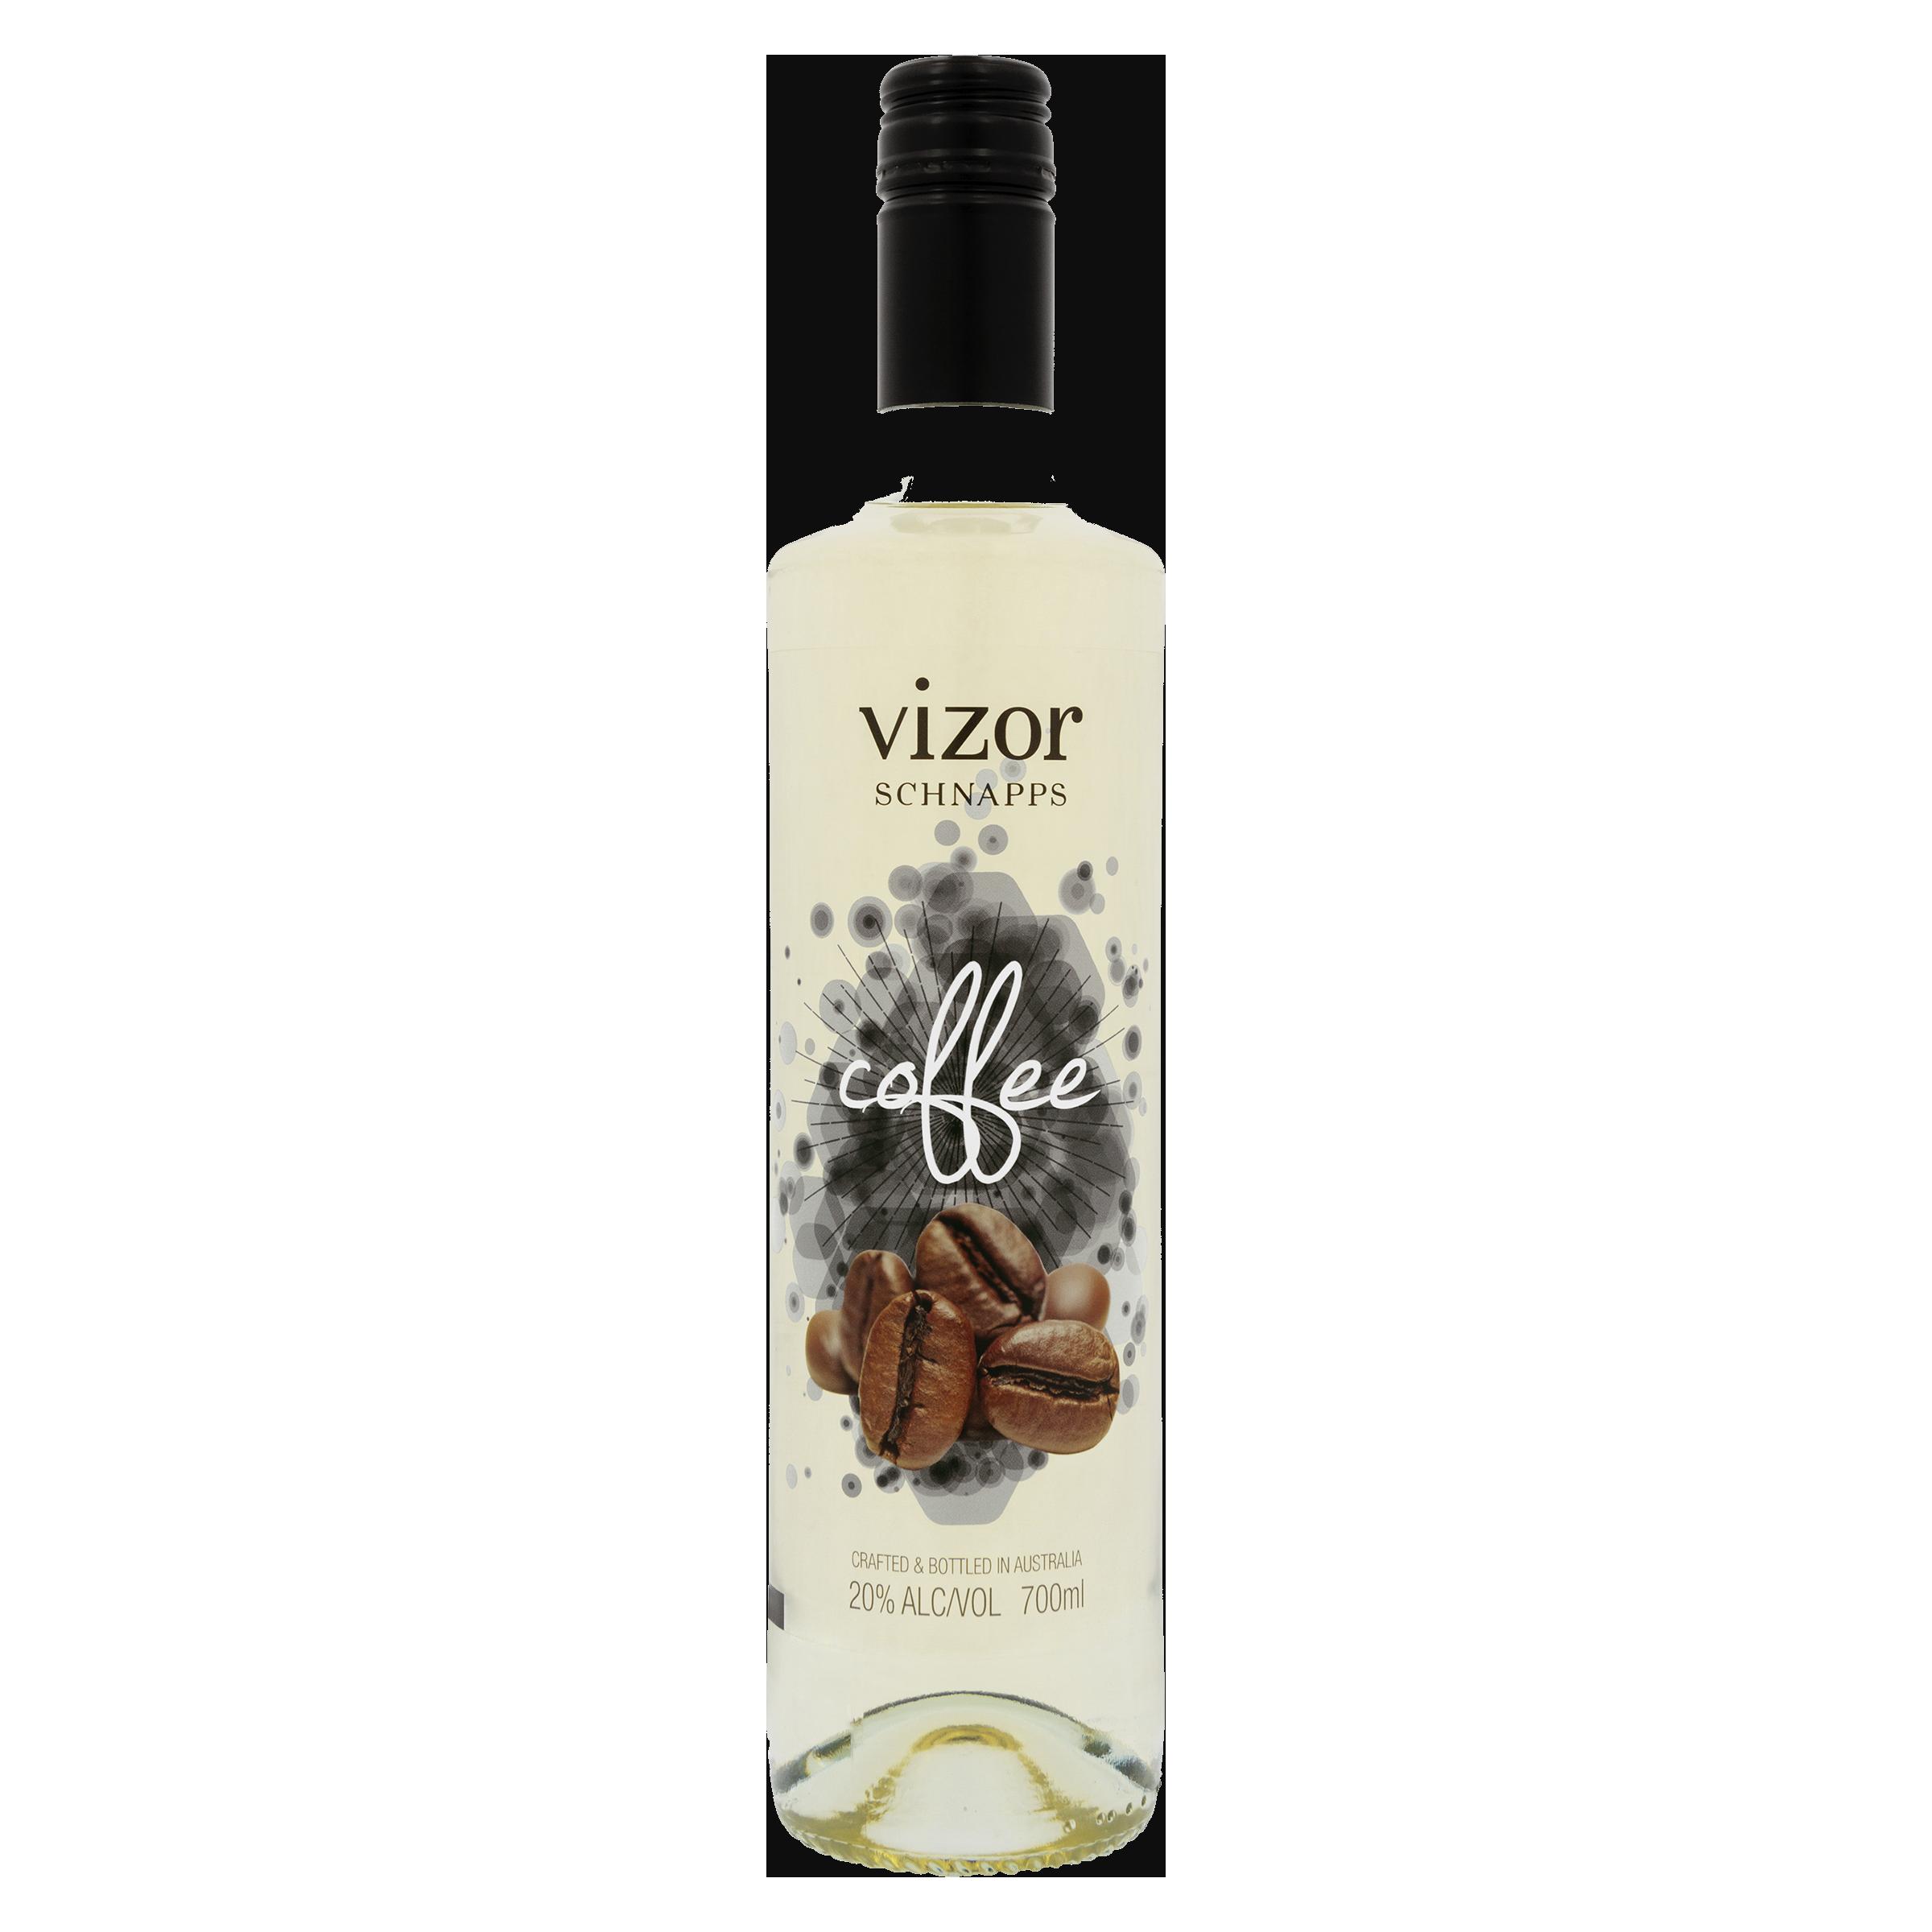 Vizor Coffee Schnapps 700mL